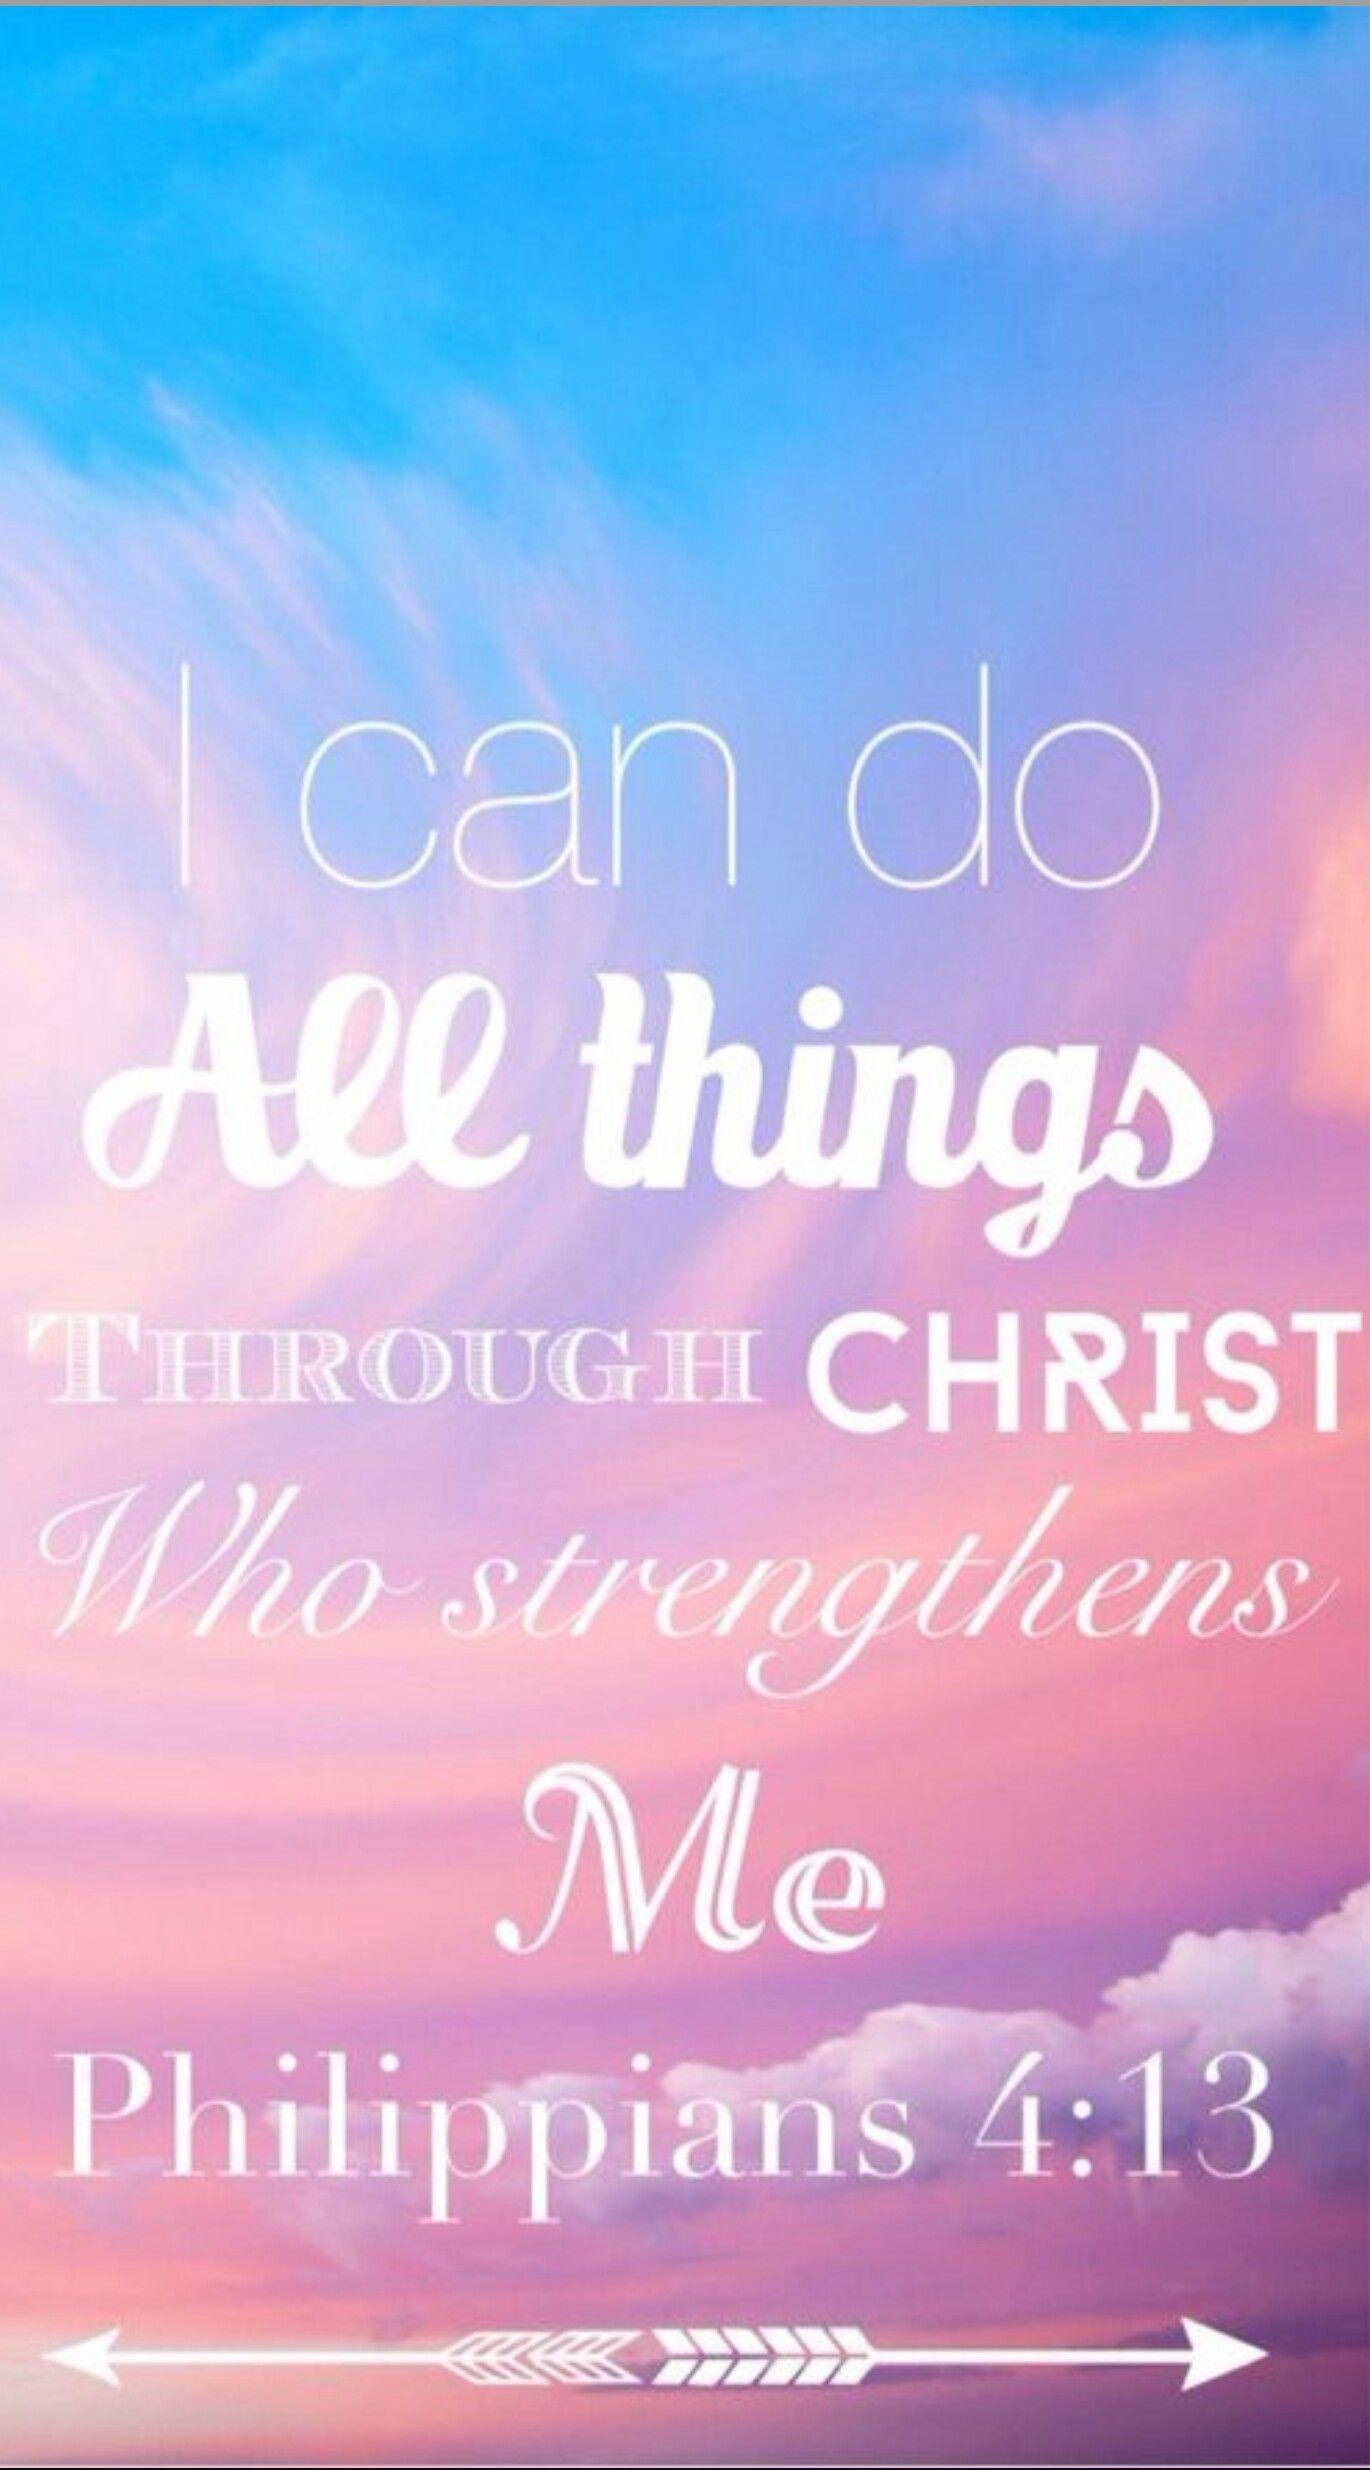 Hd Scripture Wallpaper Posted By Samantha Peltier